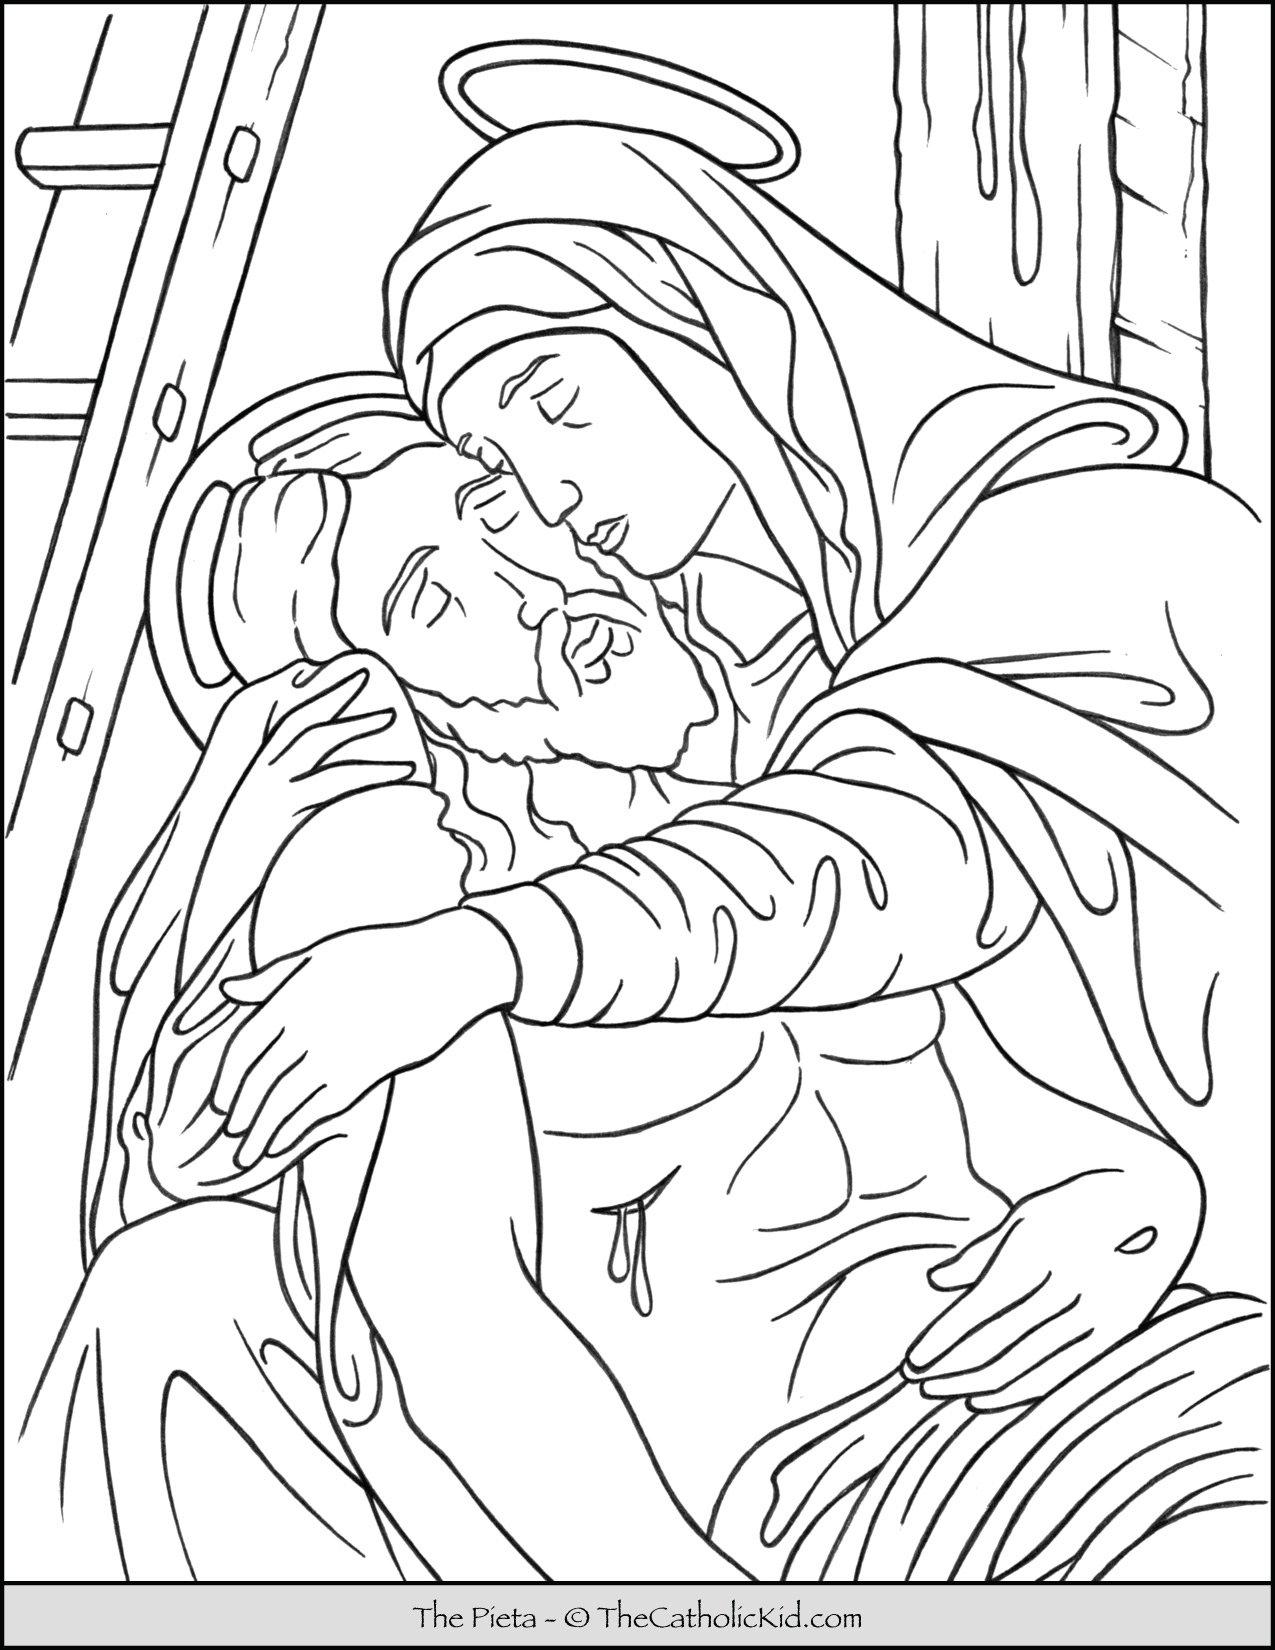 Pieta Coloring Page